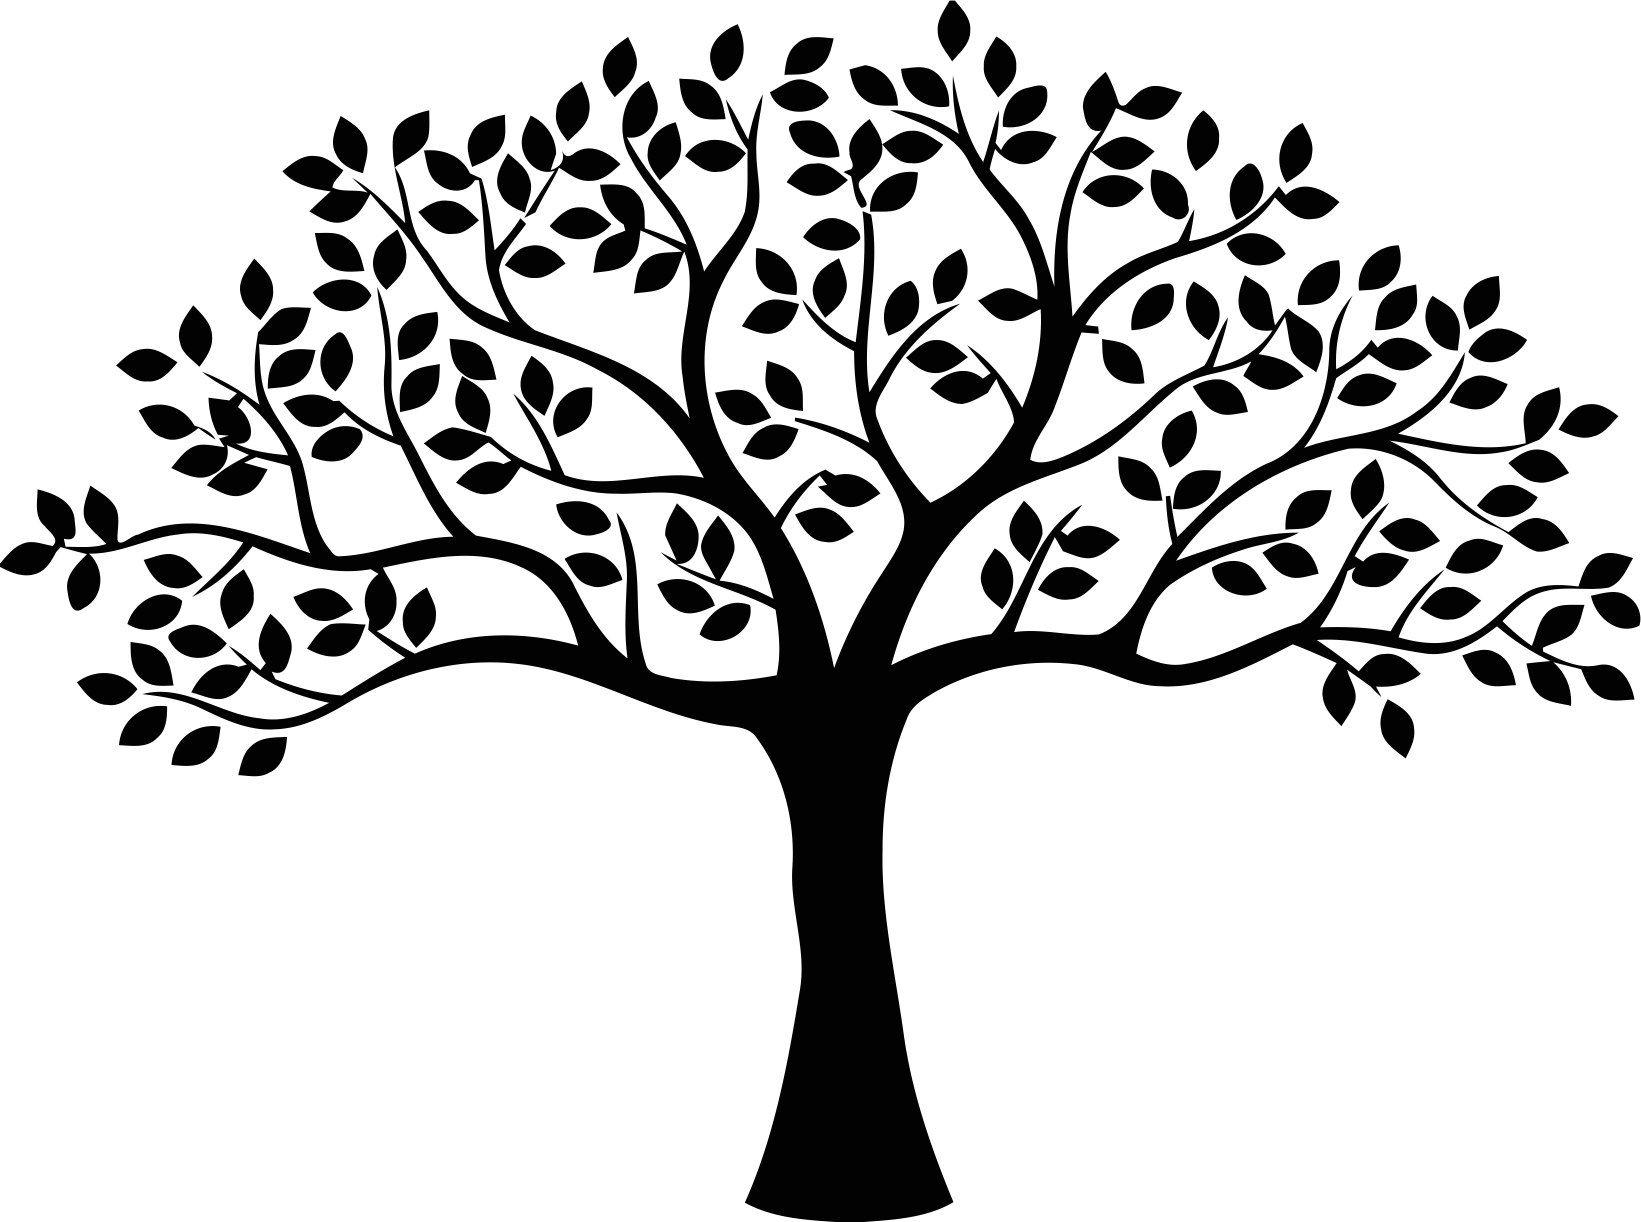 Decor Tree Free Vector cdr Download.